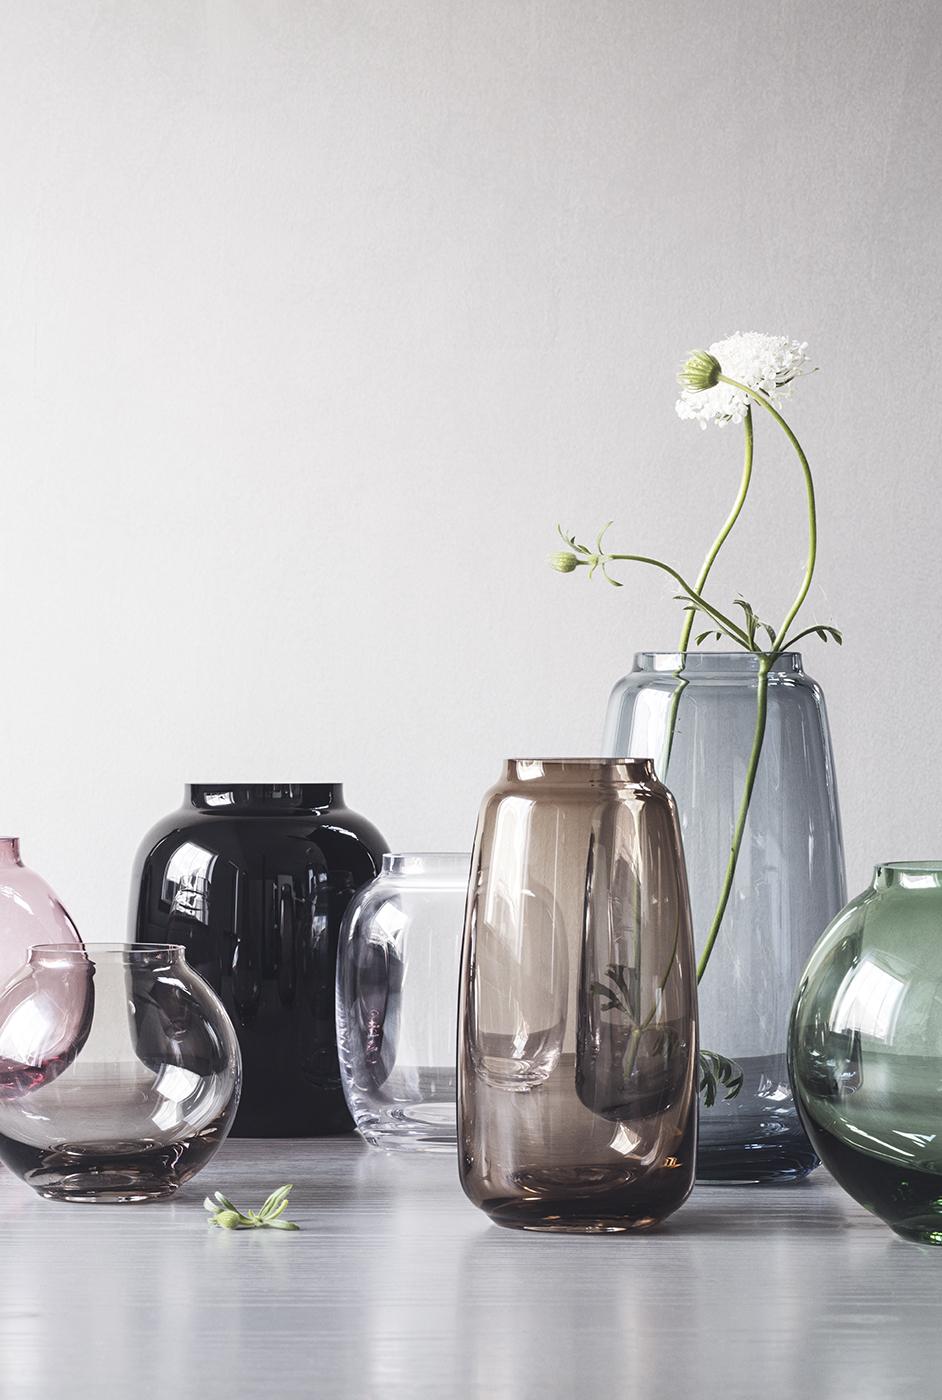 Lyngby Porcelain 02.jpg